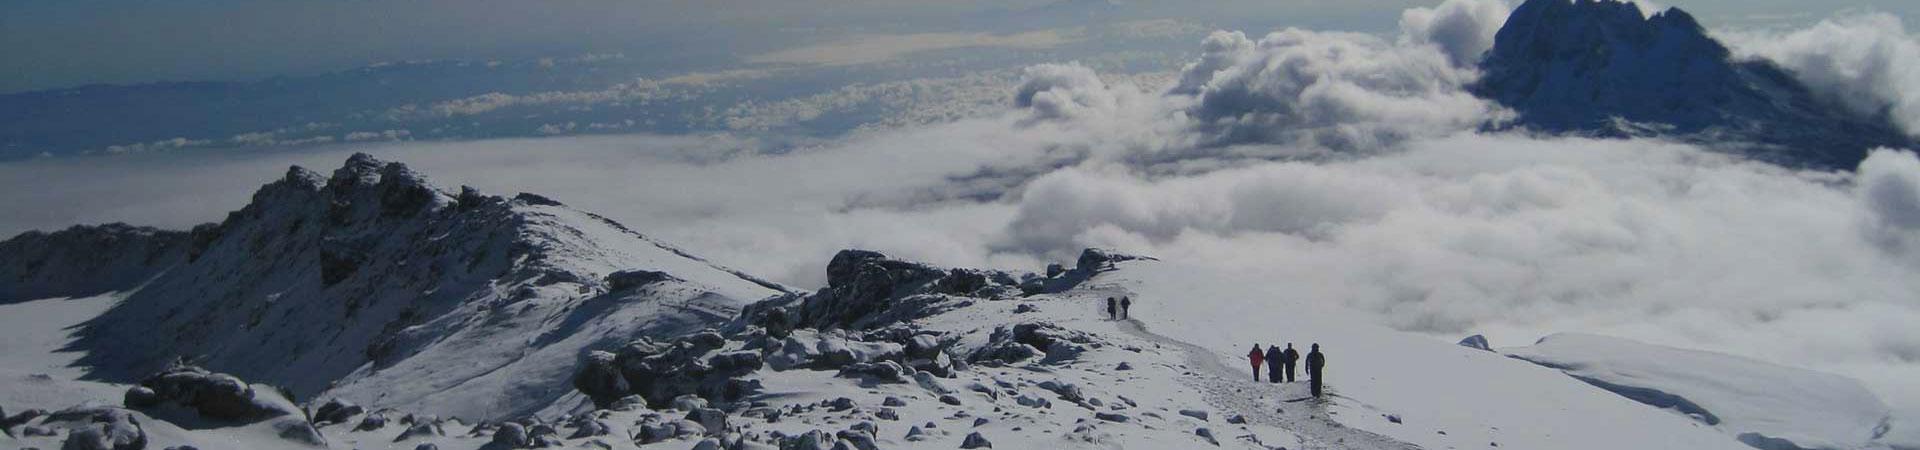 6-Days-Climbing-Kilimanjaro-via-Umbwe-Route.